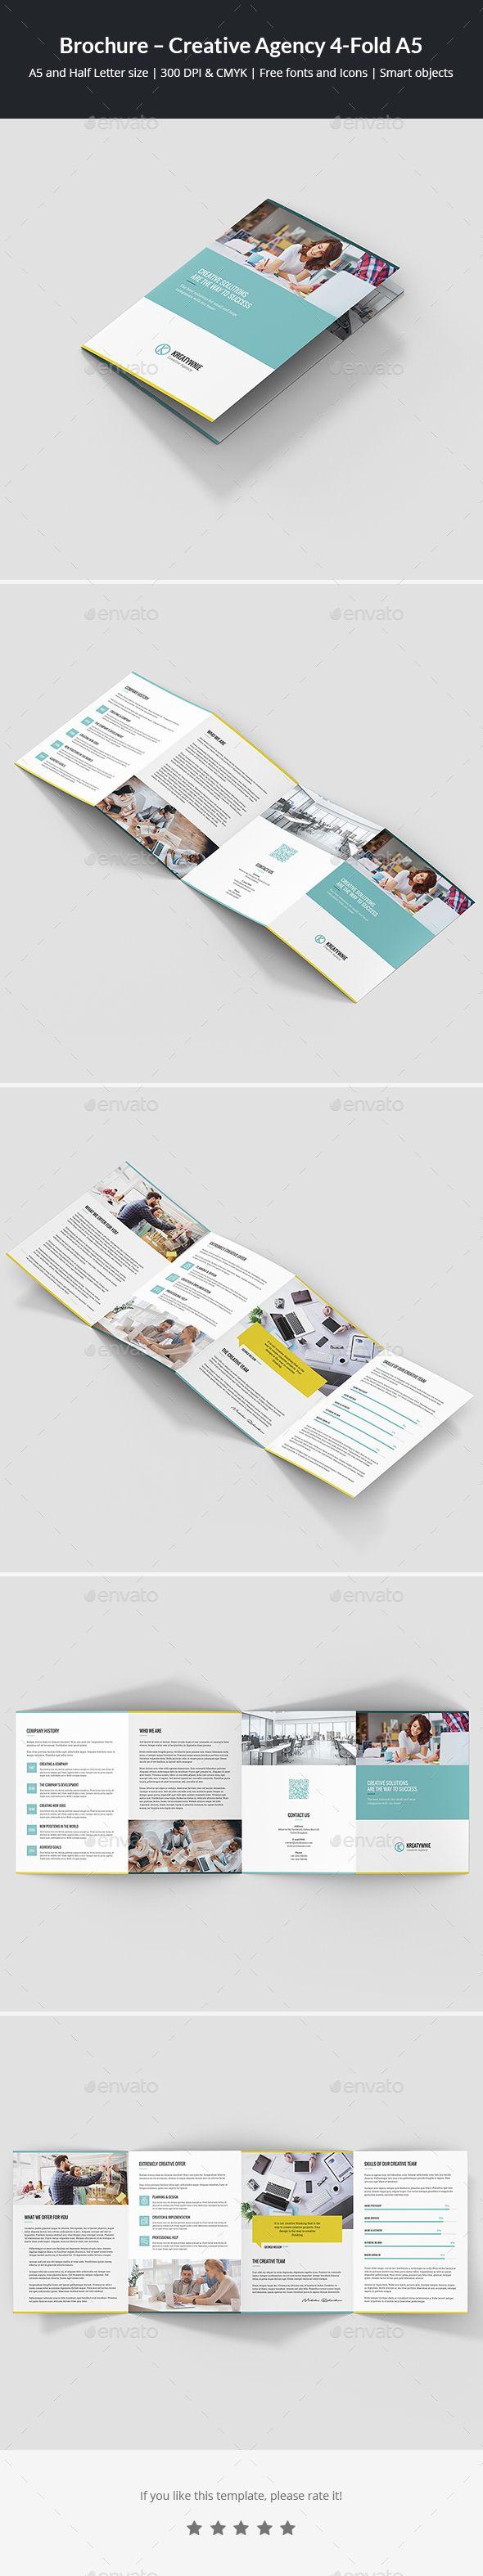 Brochure  Creative Agency Fold A  Brochures Brochure